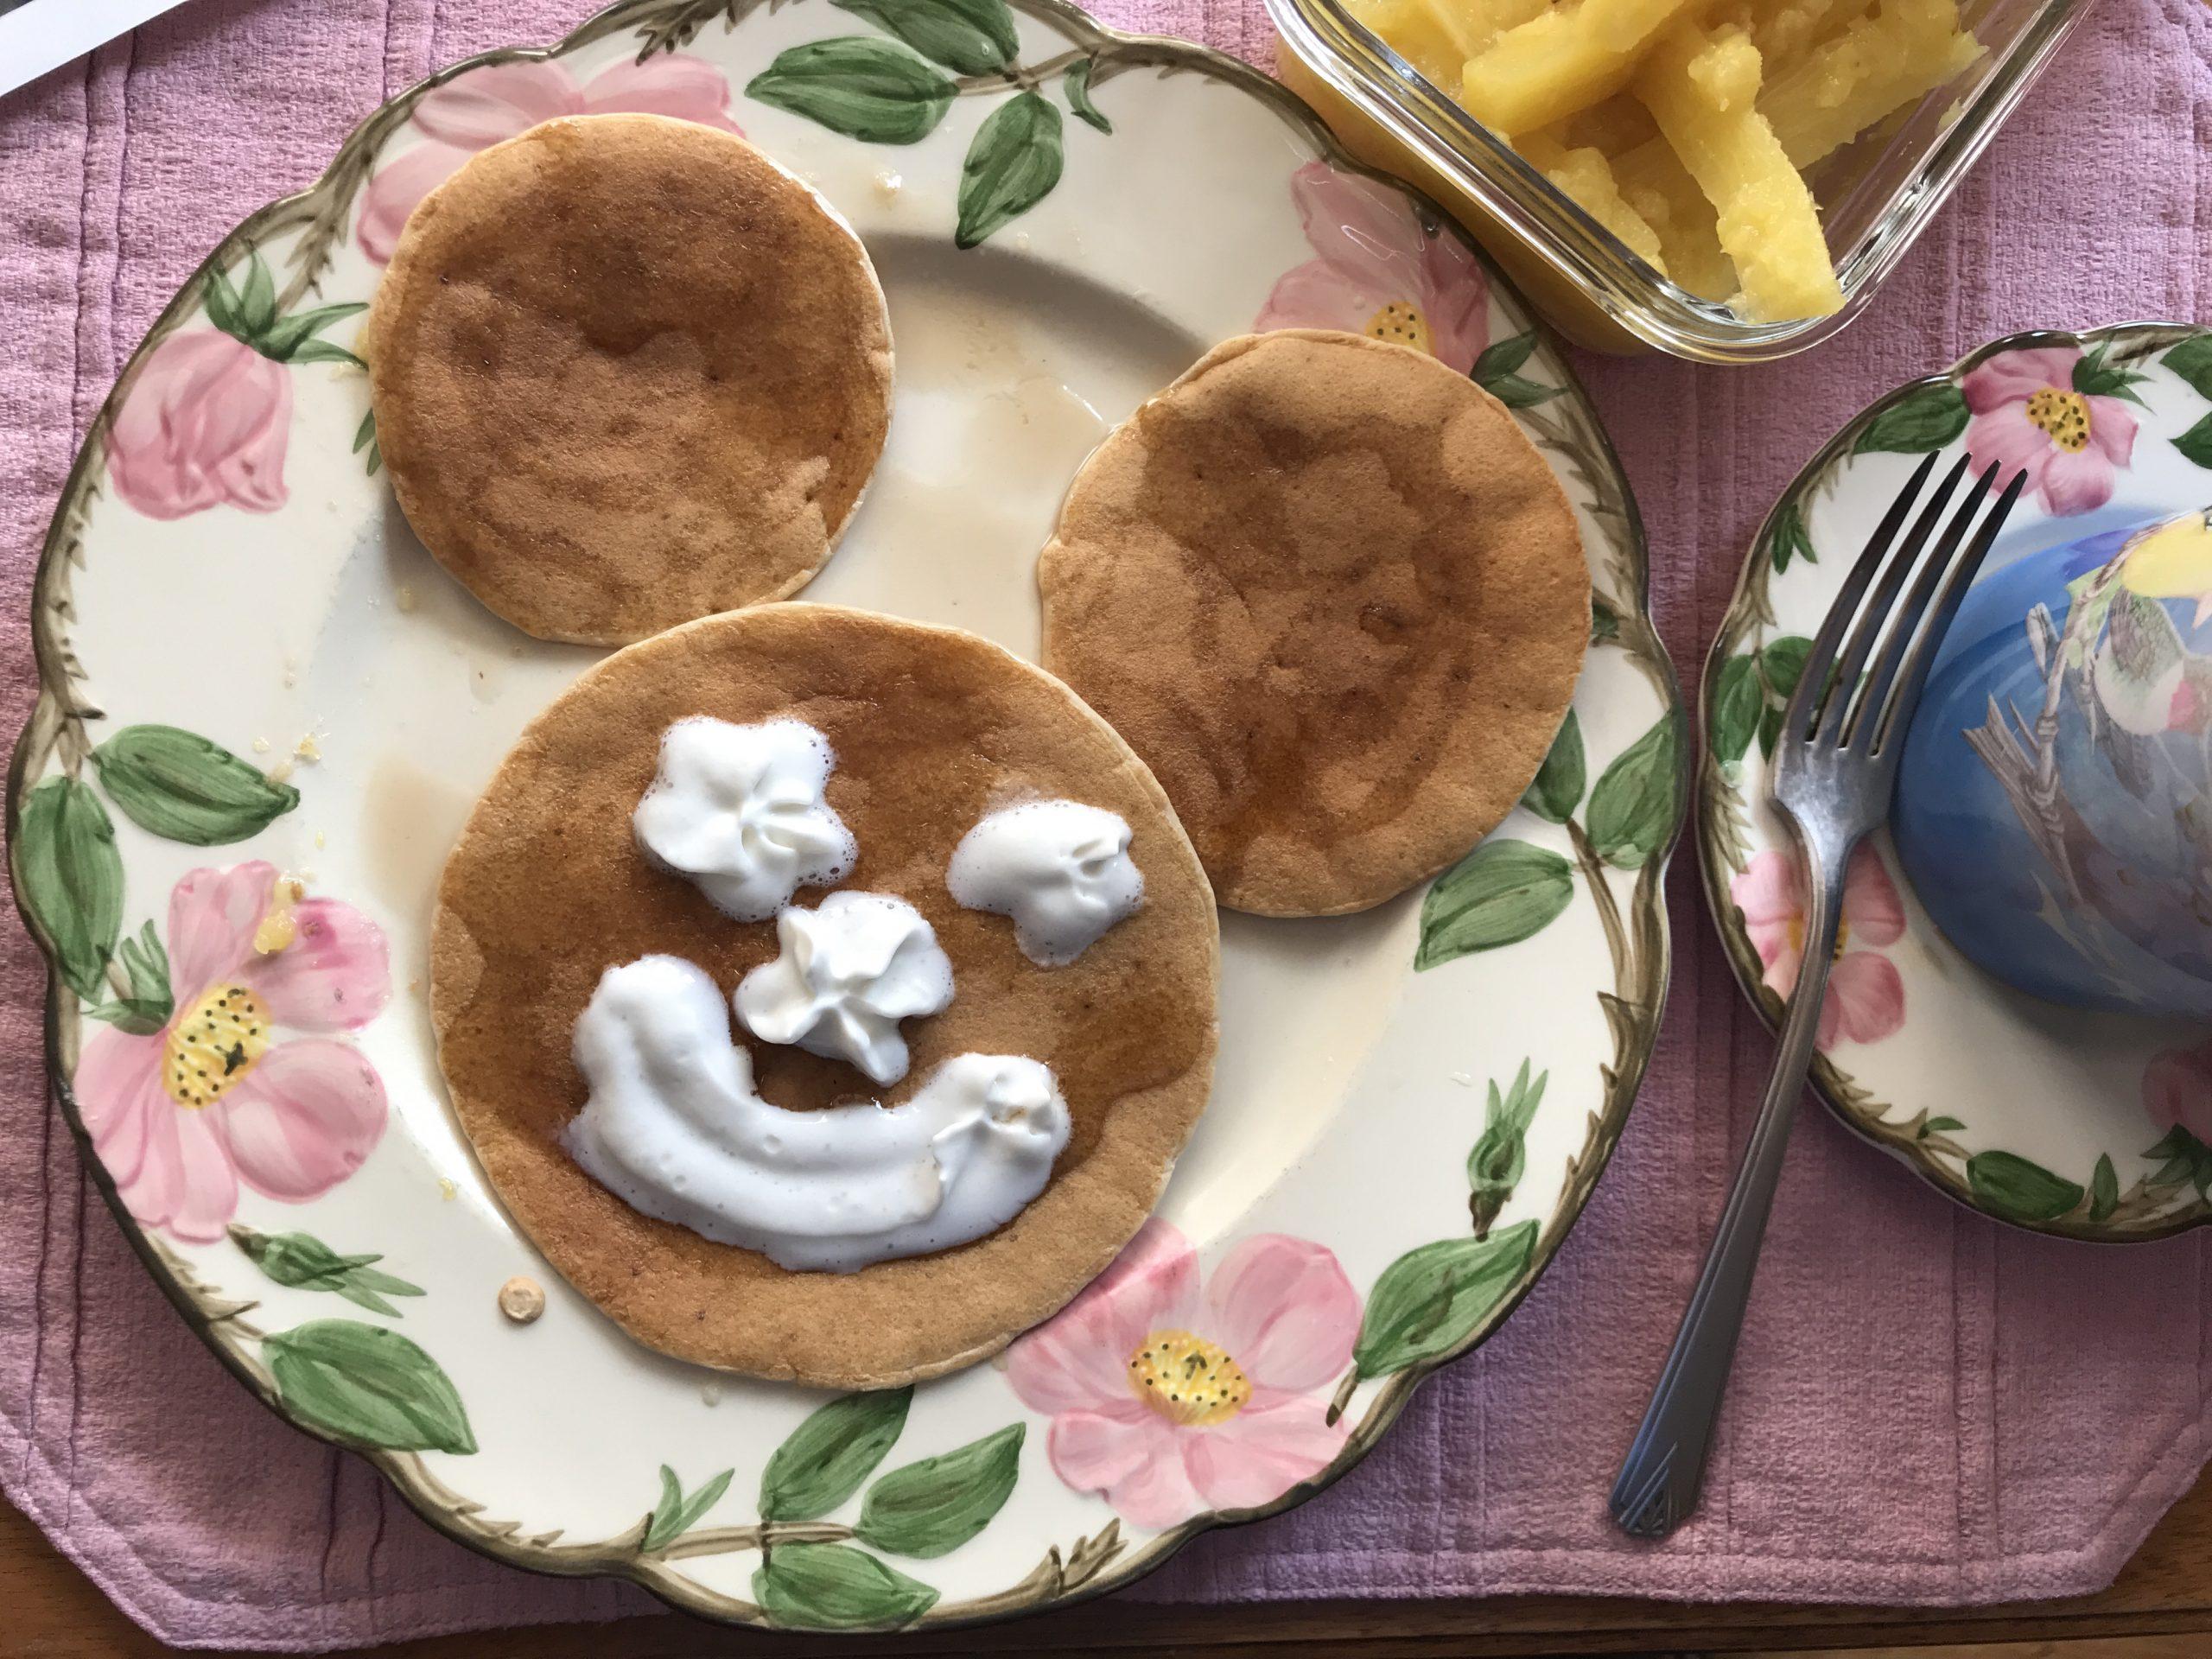 Smiley face on a pancake